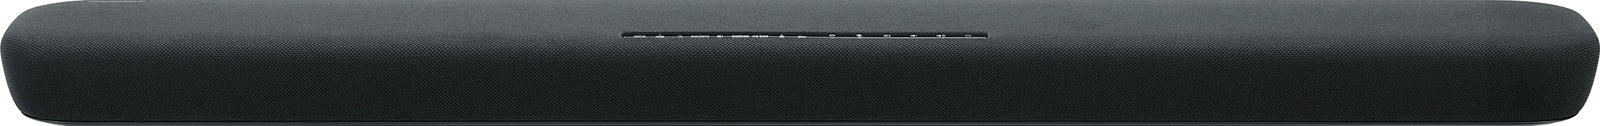 Yamaha: YAS-109 Sound Bar image